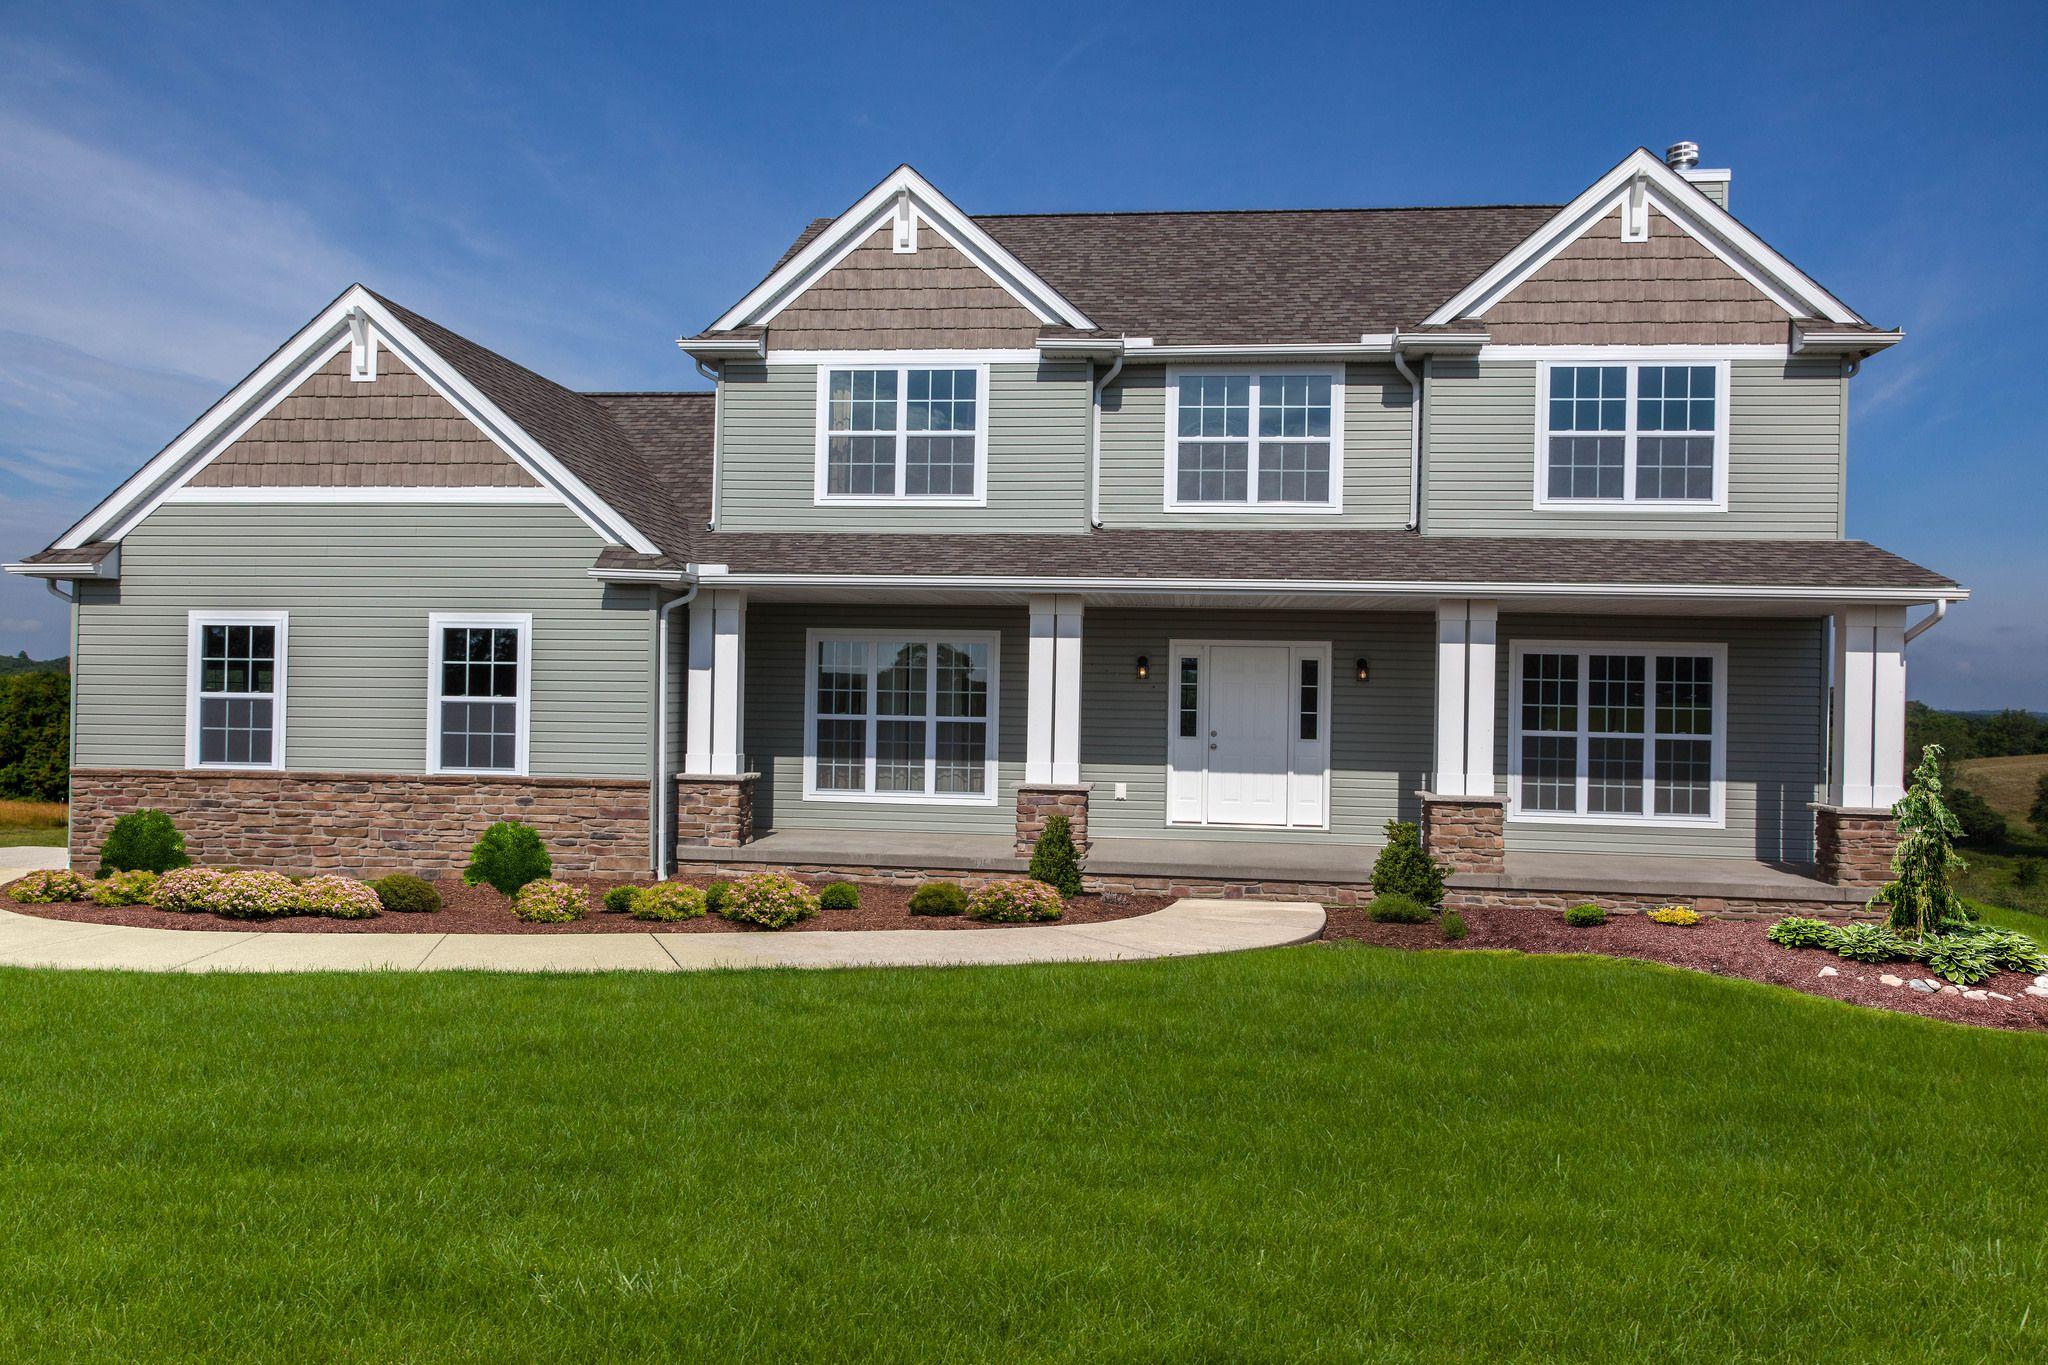 Best Washington Craftsman House Paint Exterior Wayne Homes 400 x 300